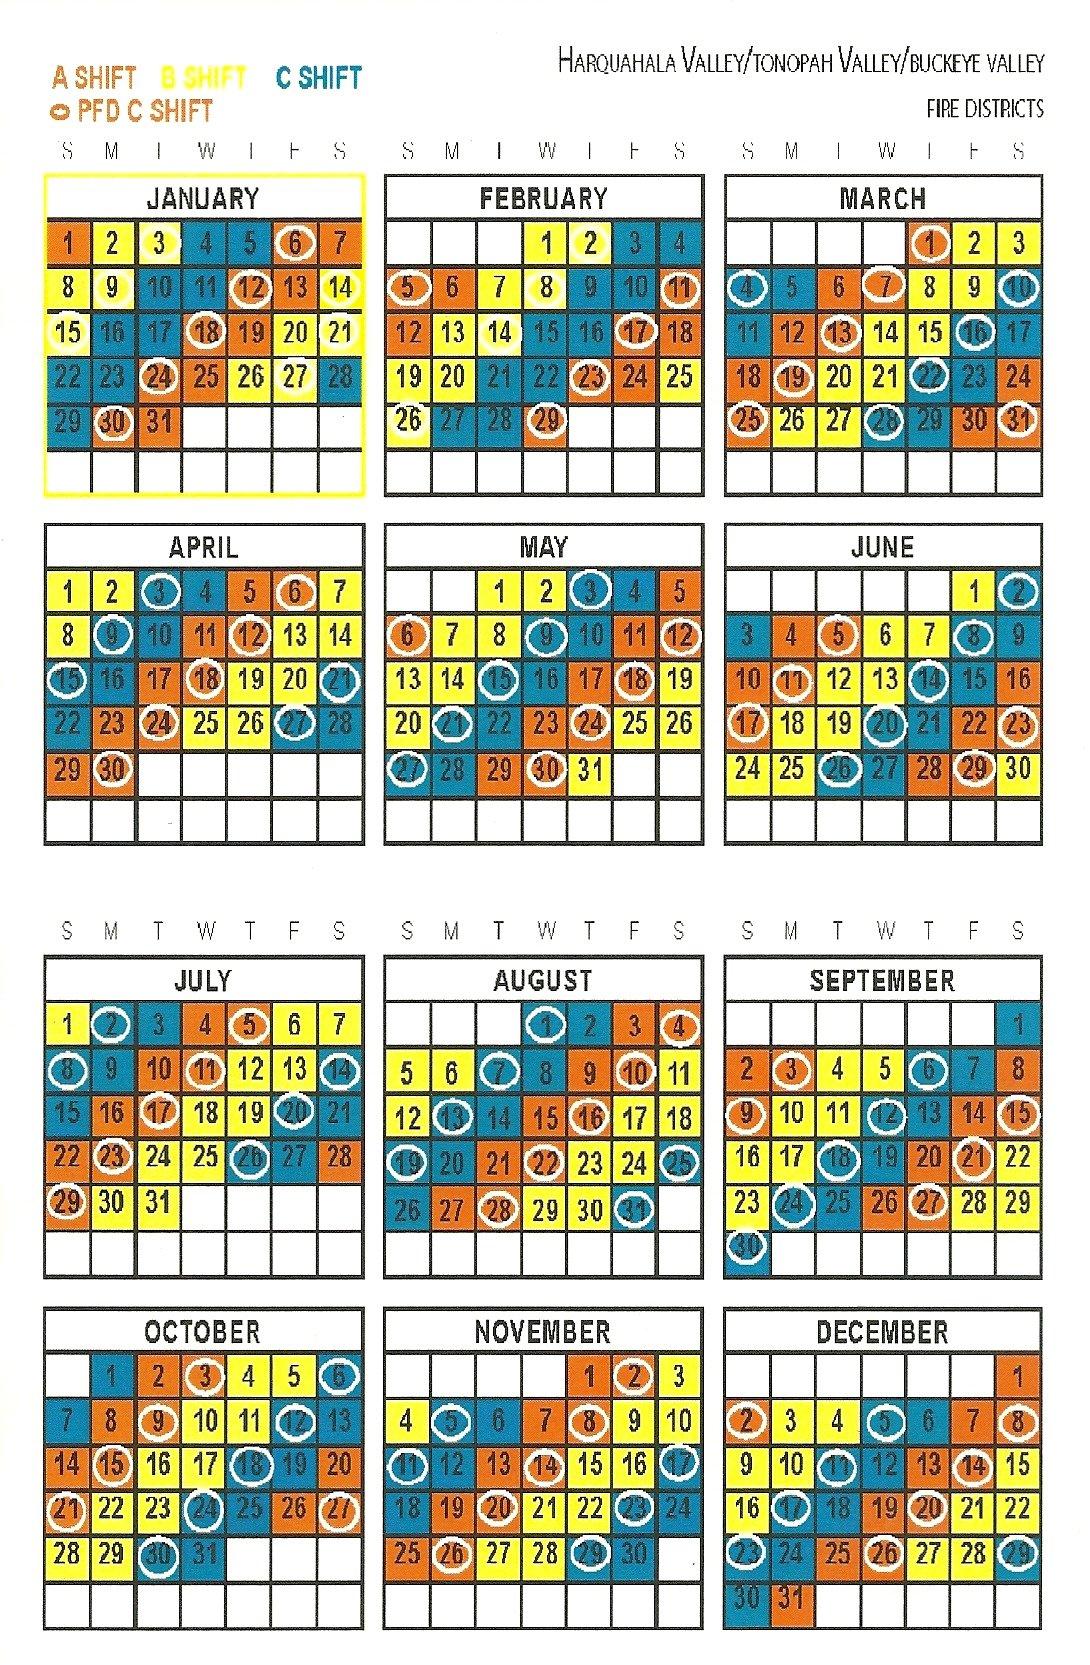 Firefighter 24/96 Shift Calendars | Calendar Printable Free Firefighter Shift Schedule Tool